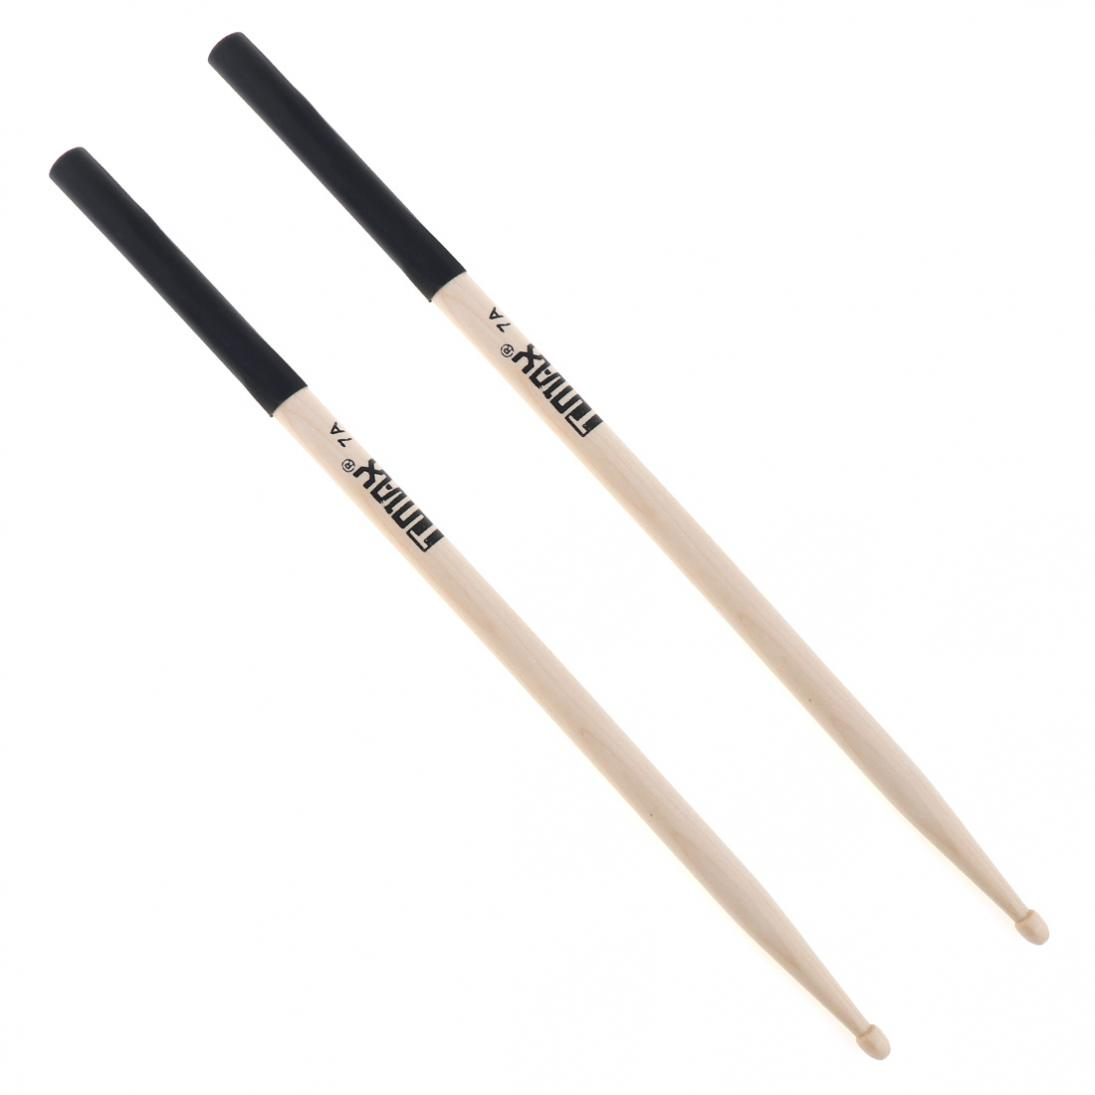 professional maple wood drum sticks. Black Bedroom Furniture Sets. Home Design Ideas